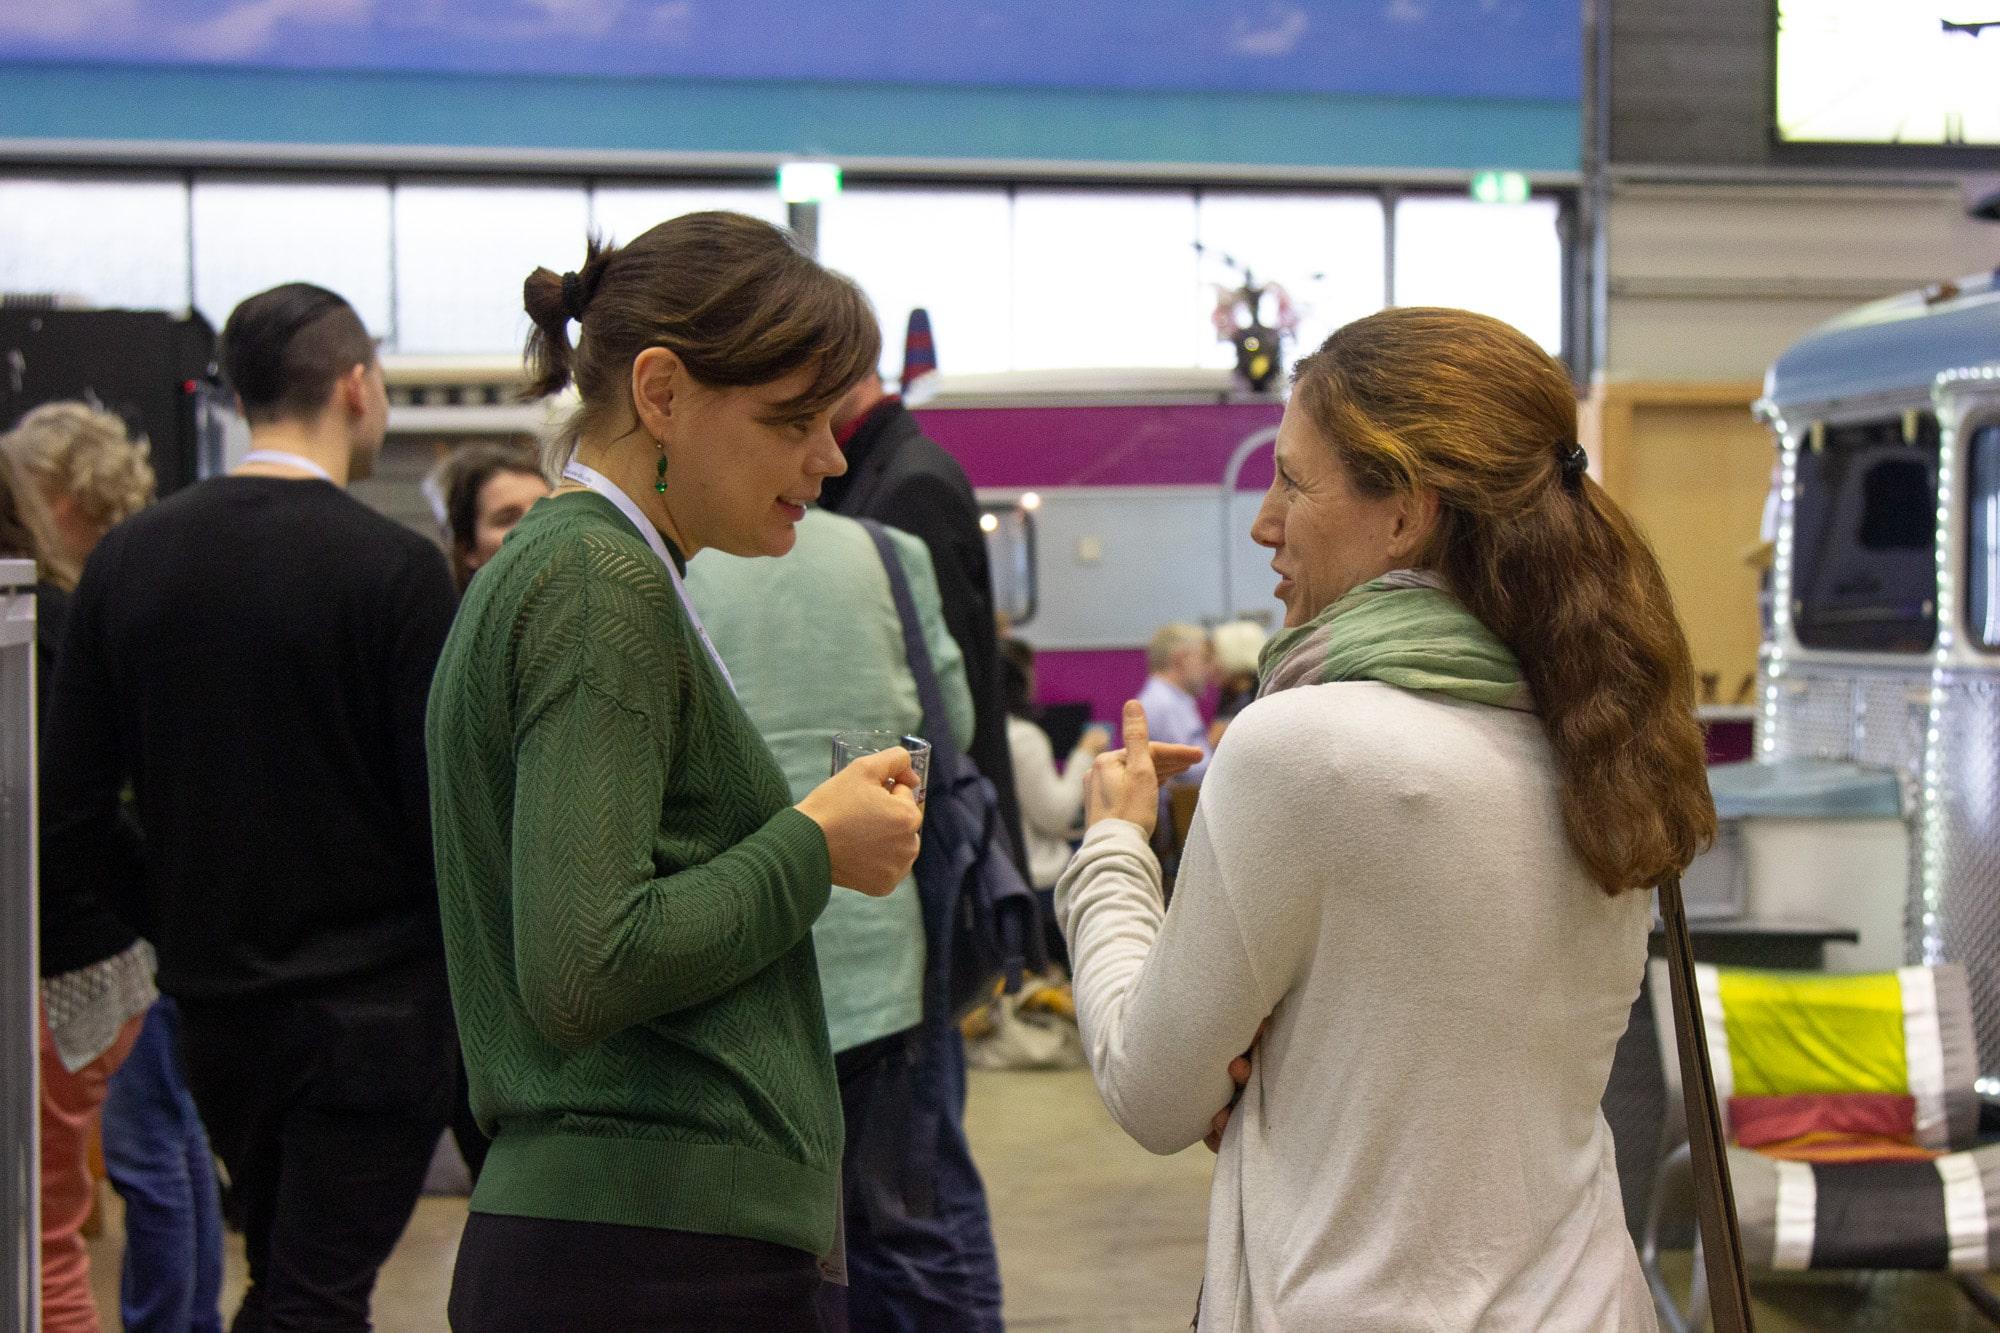 Teilnehmer des Sweetcamp des Süßstoff-Verband, Dialog, Eventmanagement